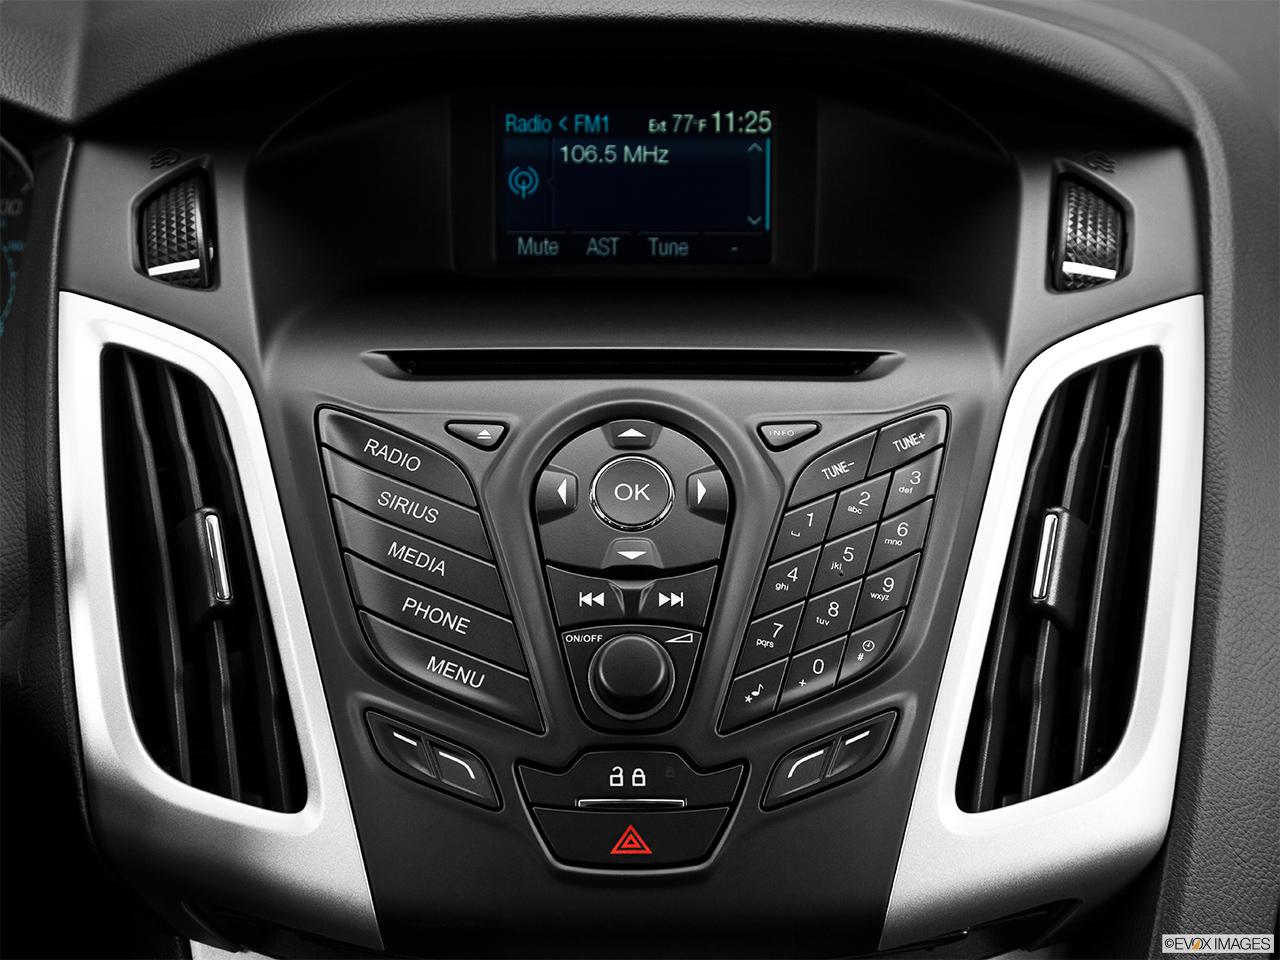 2015 ford focus 4dr sedan se closeup of radio head unit